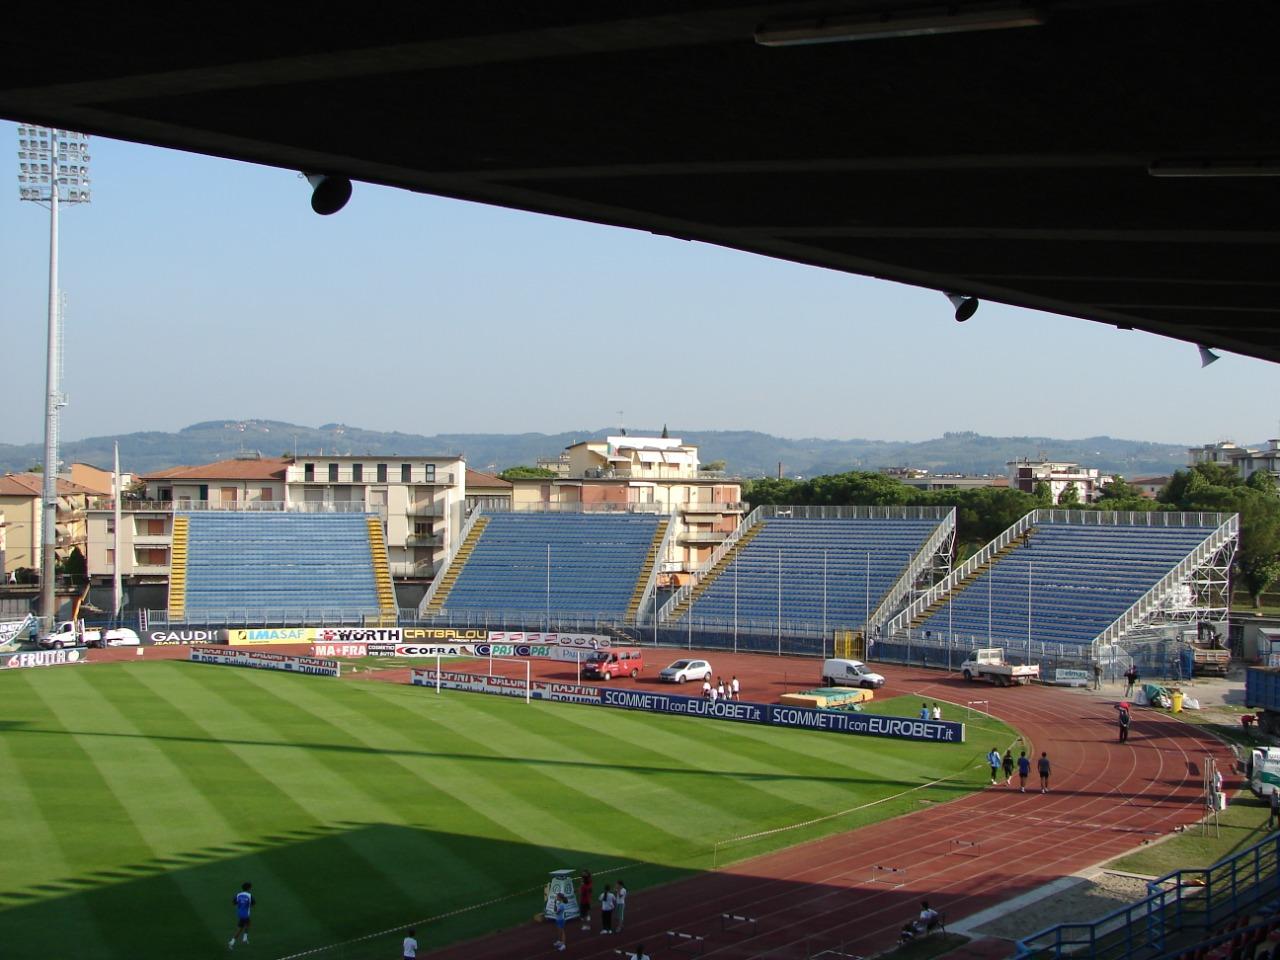 Gallery foto n.1 Support scaffolding - Carlo Castellani Stadium